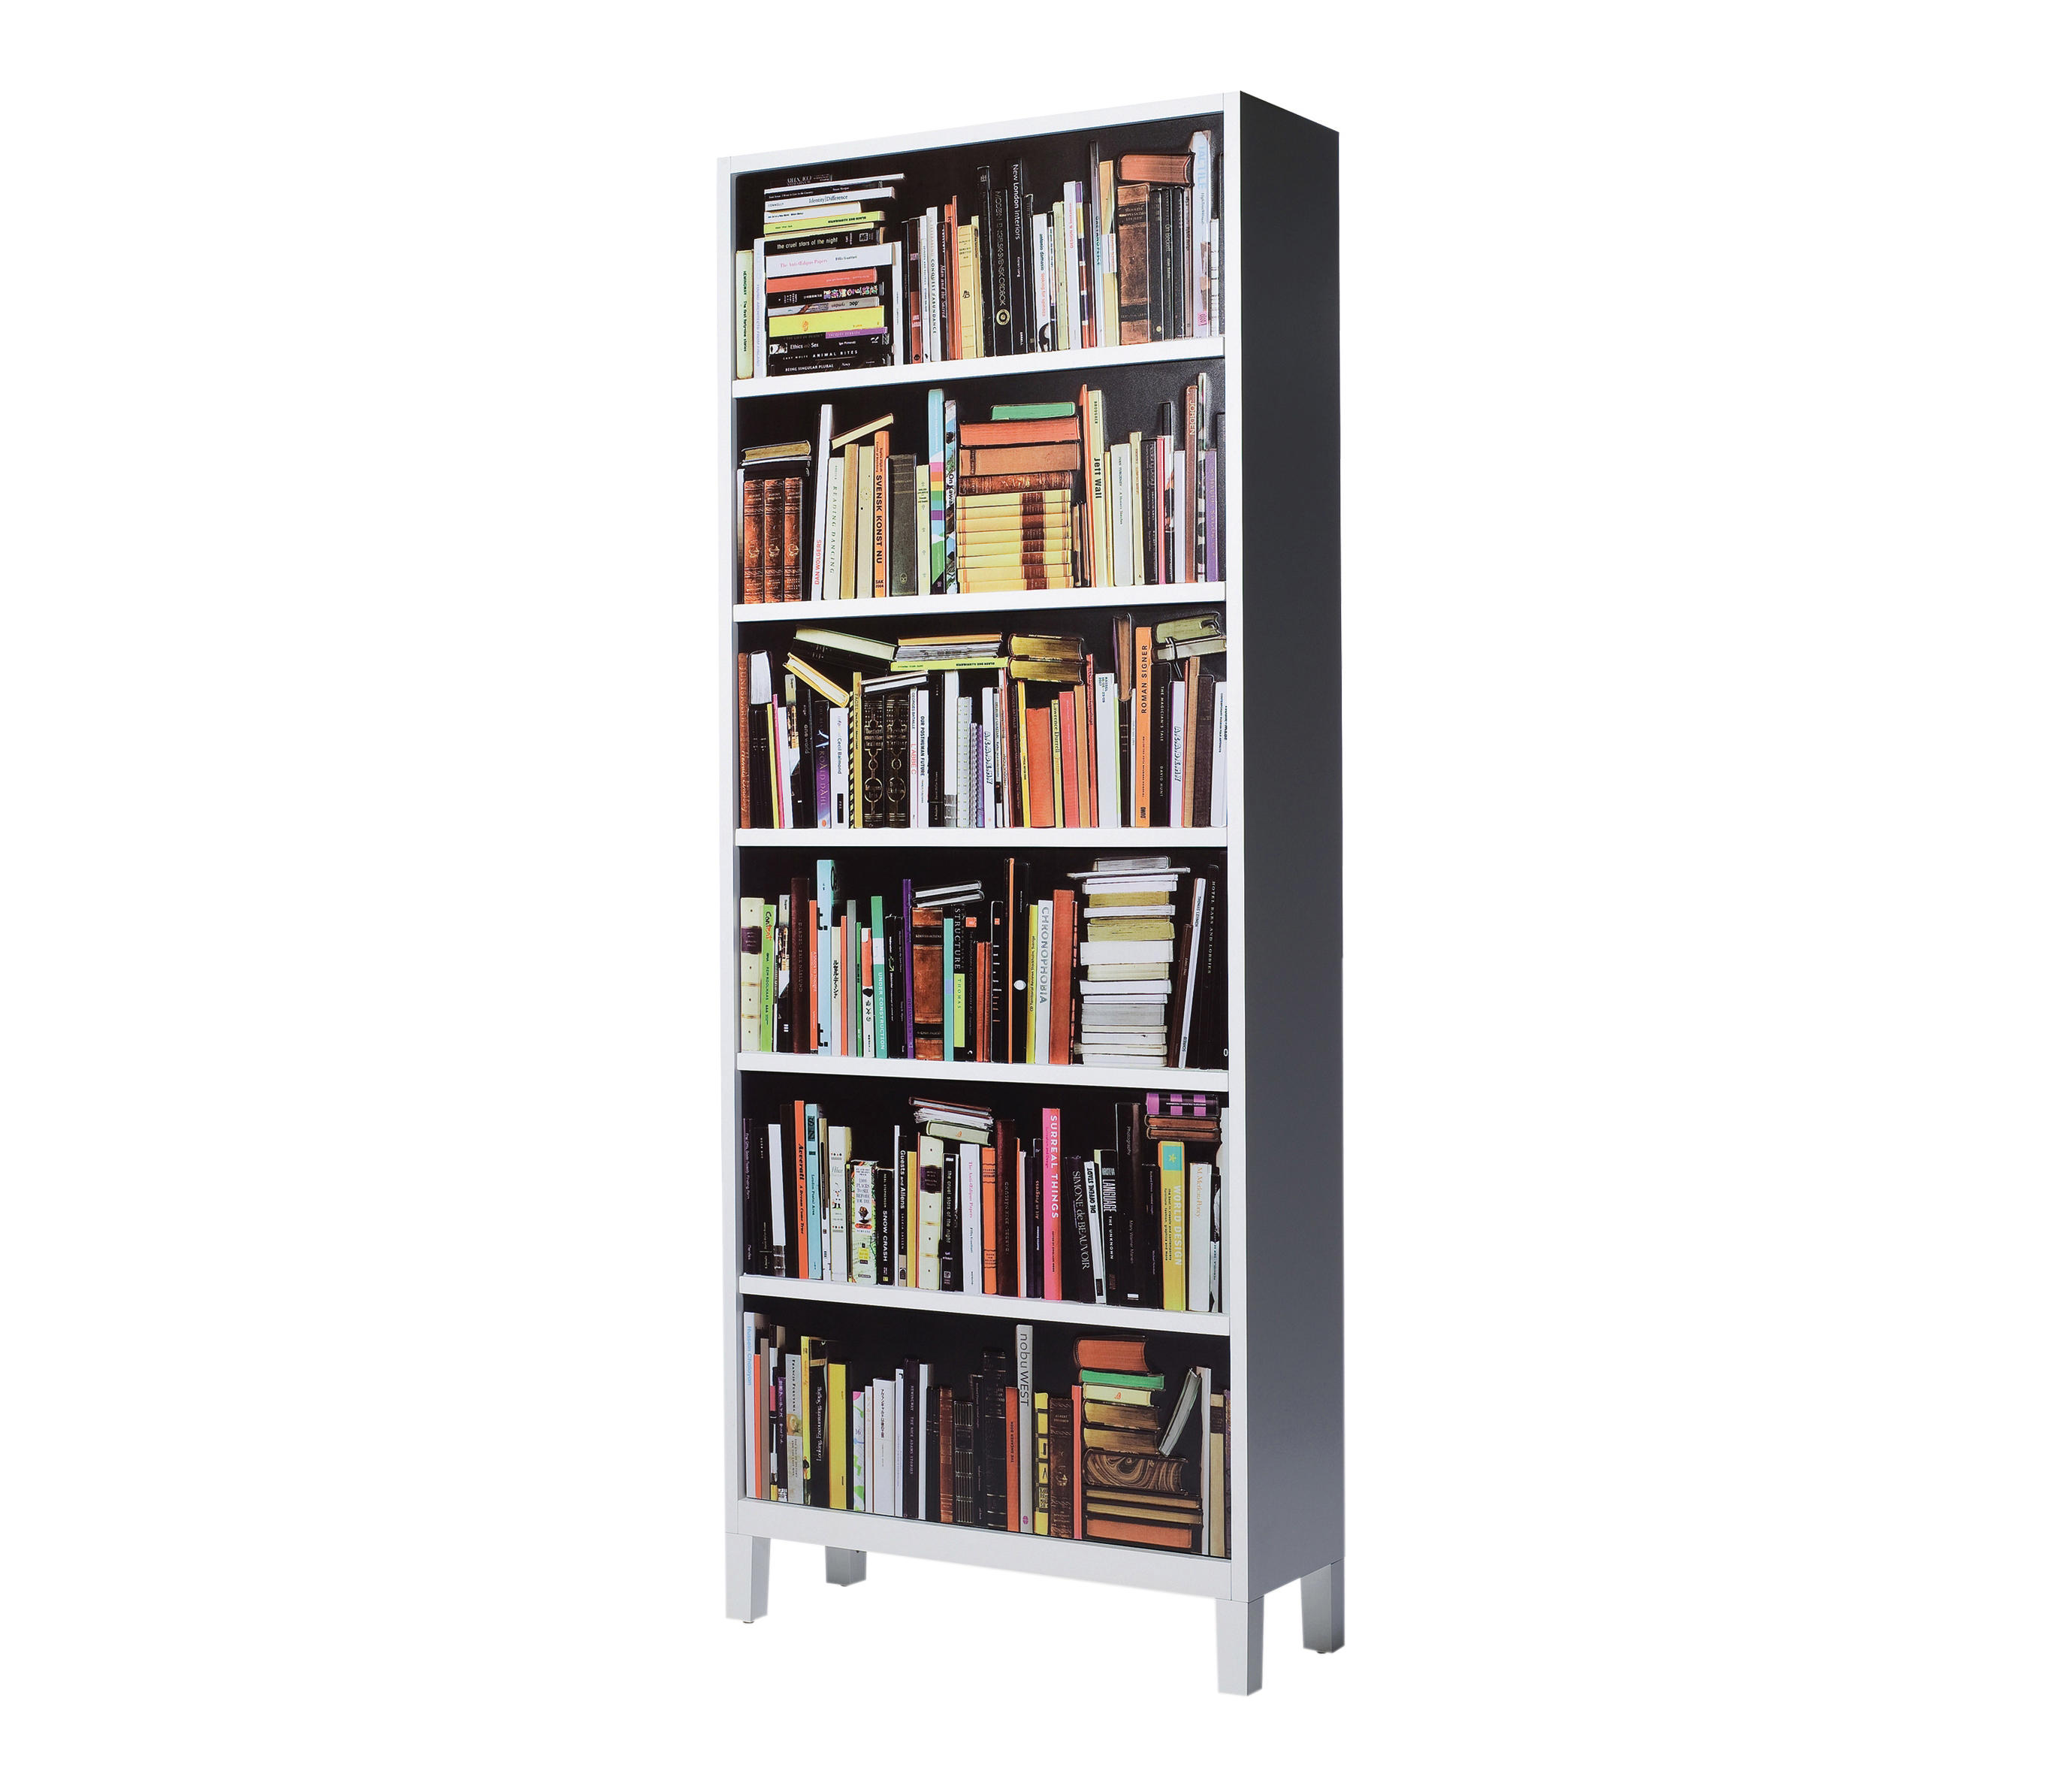 Bookshelf Cupboard By Skitsch Hub Design